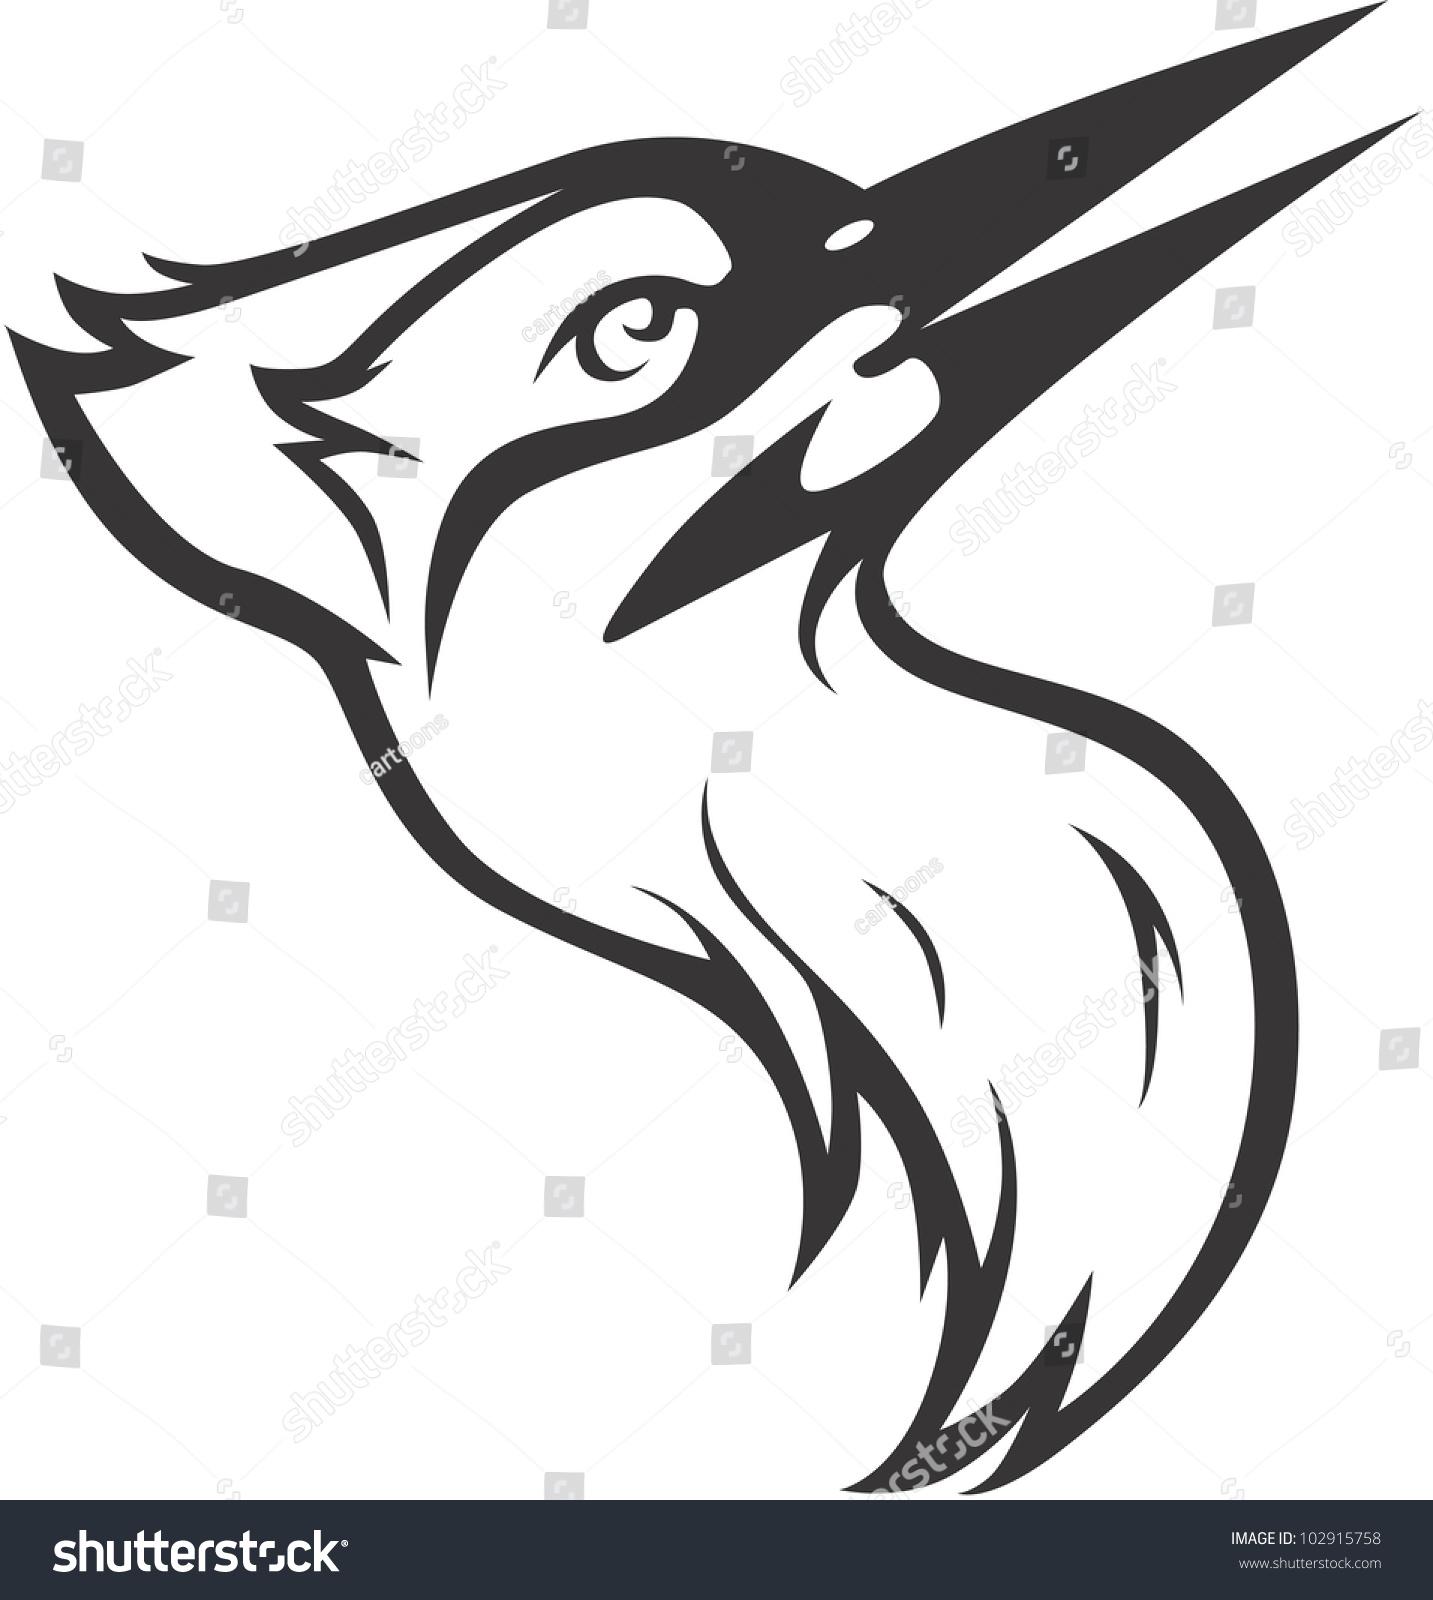 creative ivory billed woodpecker illustration